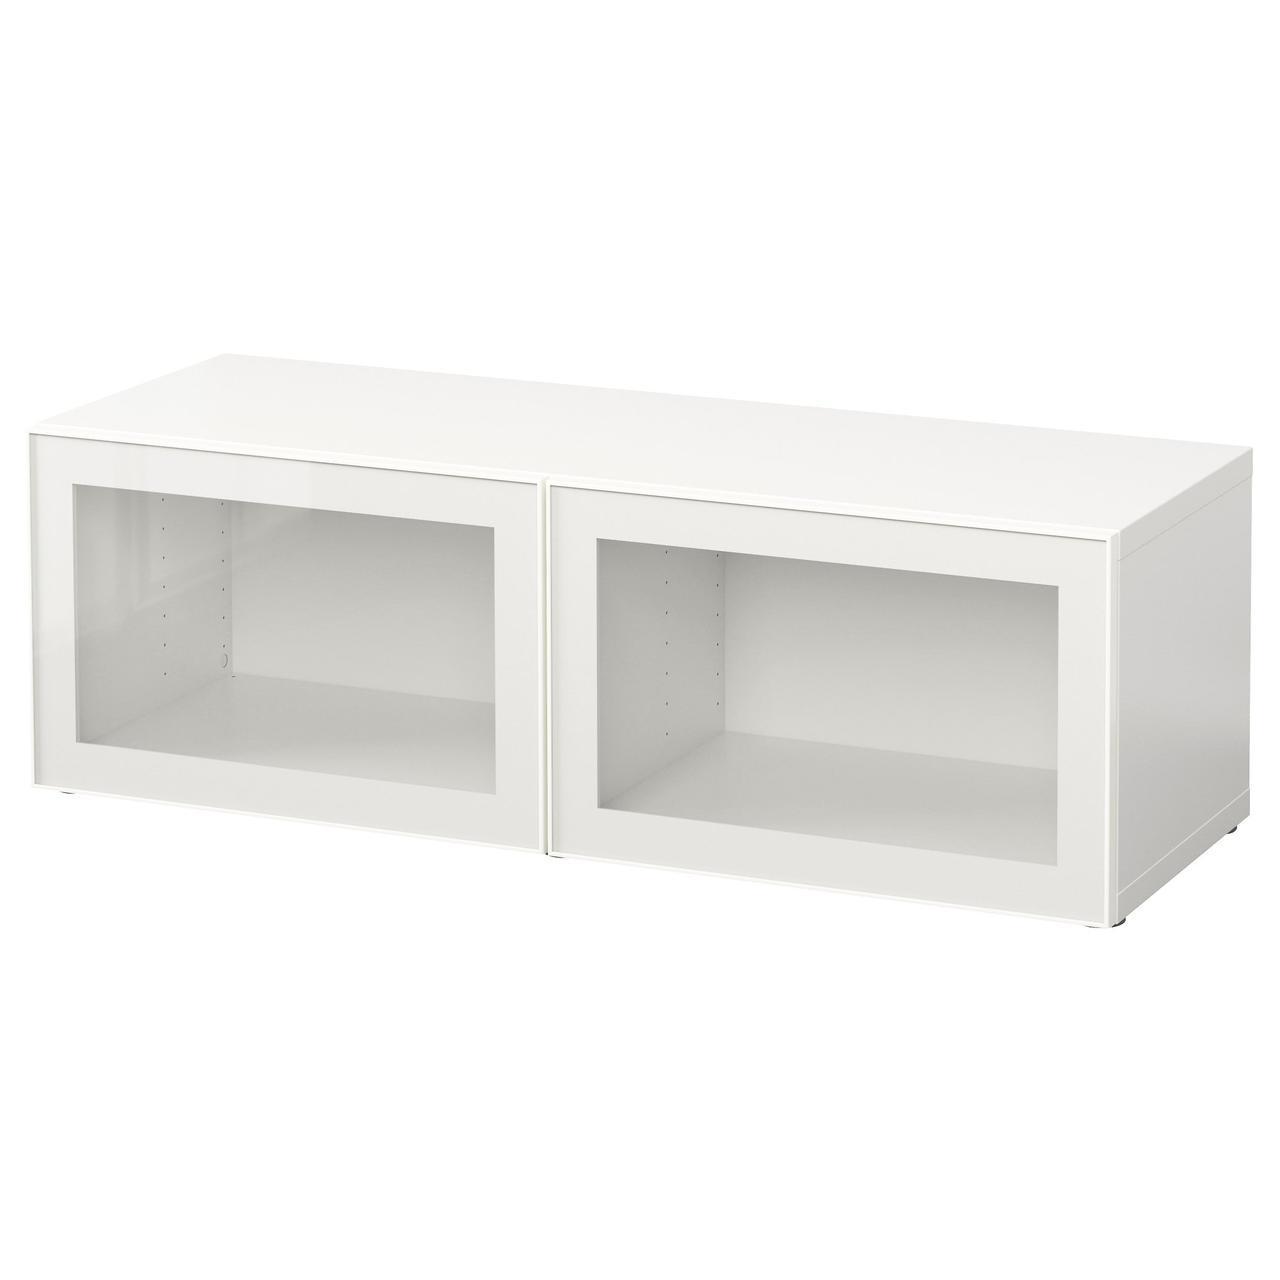 ✅ IKEA BESTA (490.478.07) Шкаф, Glassvik белый